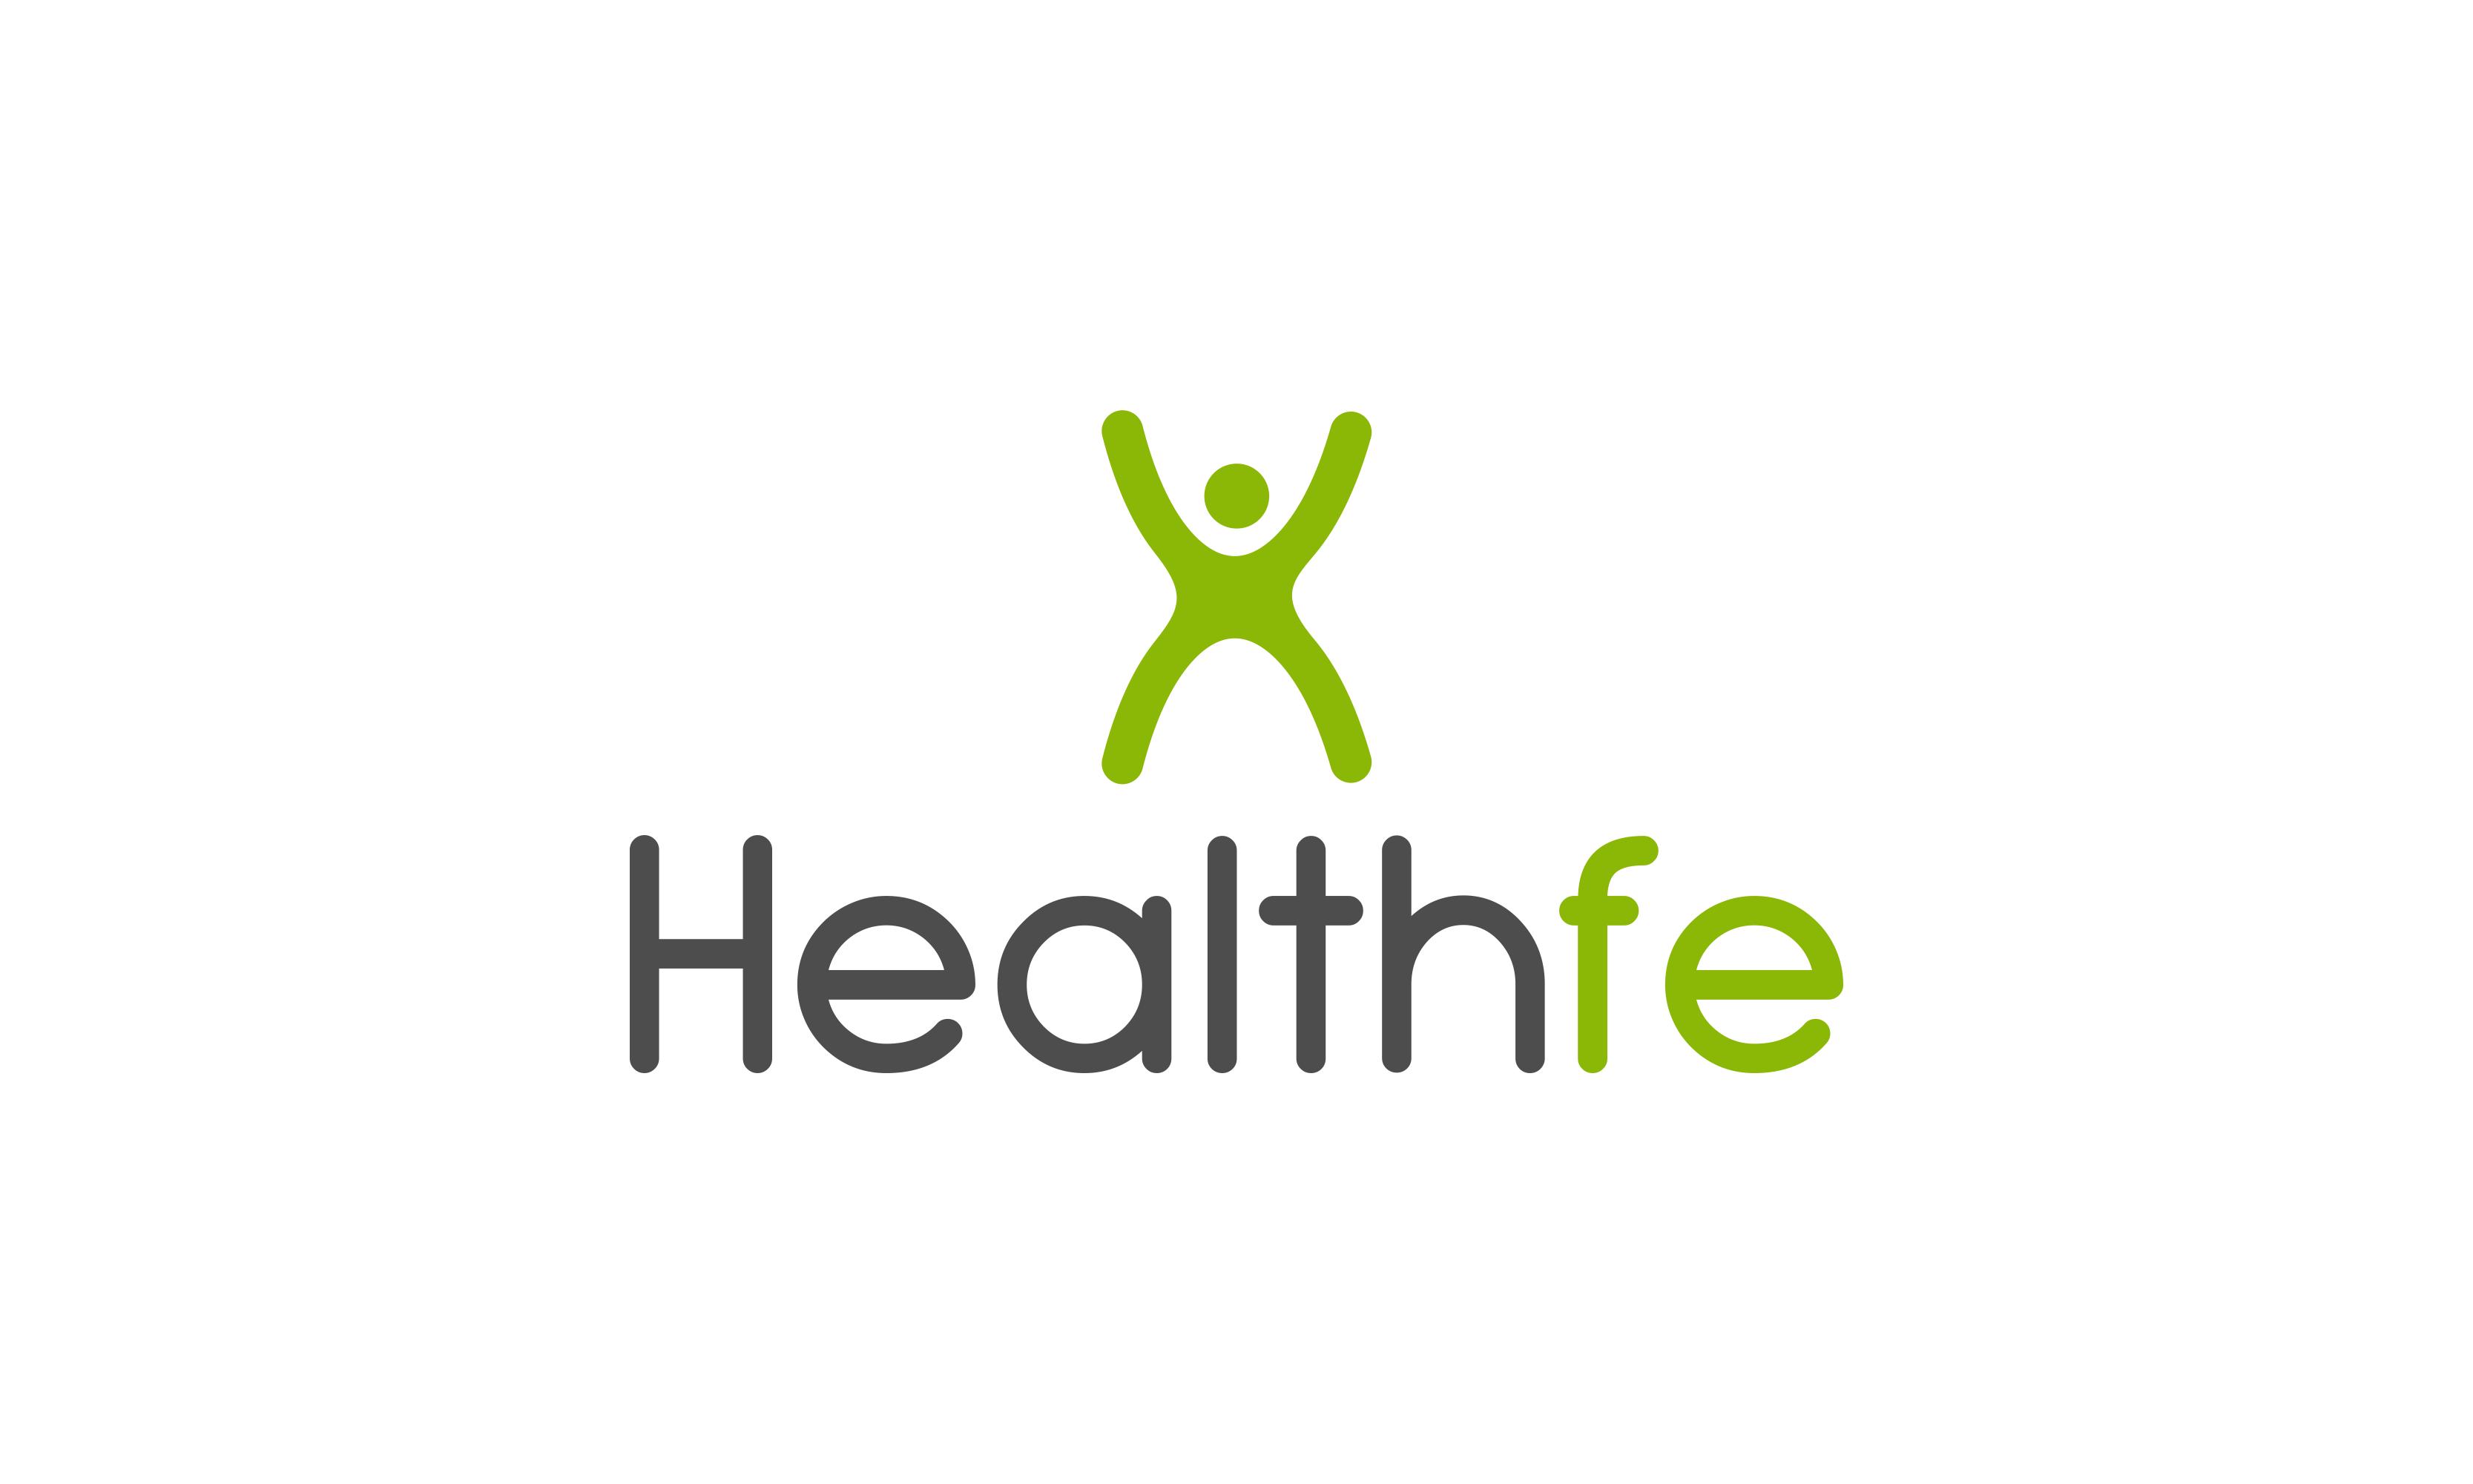 Healthfe